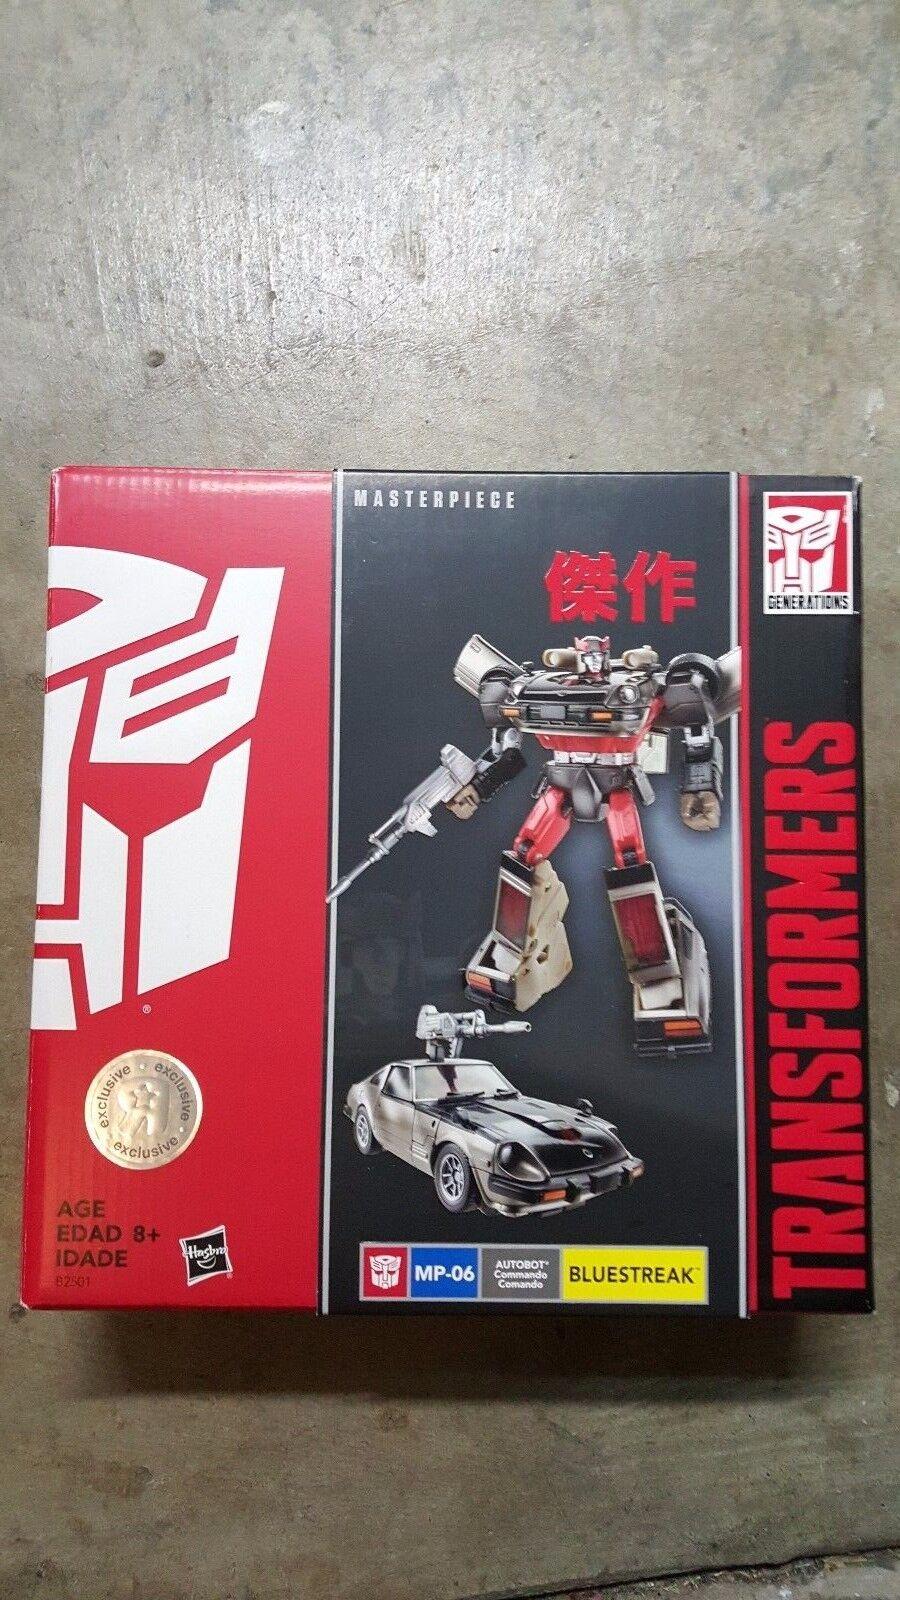 Brand New Transformers Masterpiece blueestreak Hasbro Toys R Us Exclusive MP-06